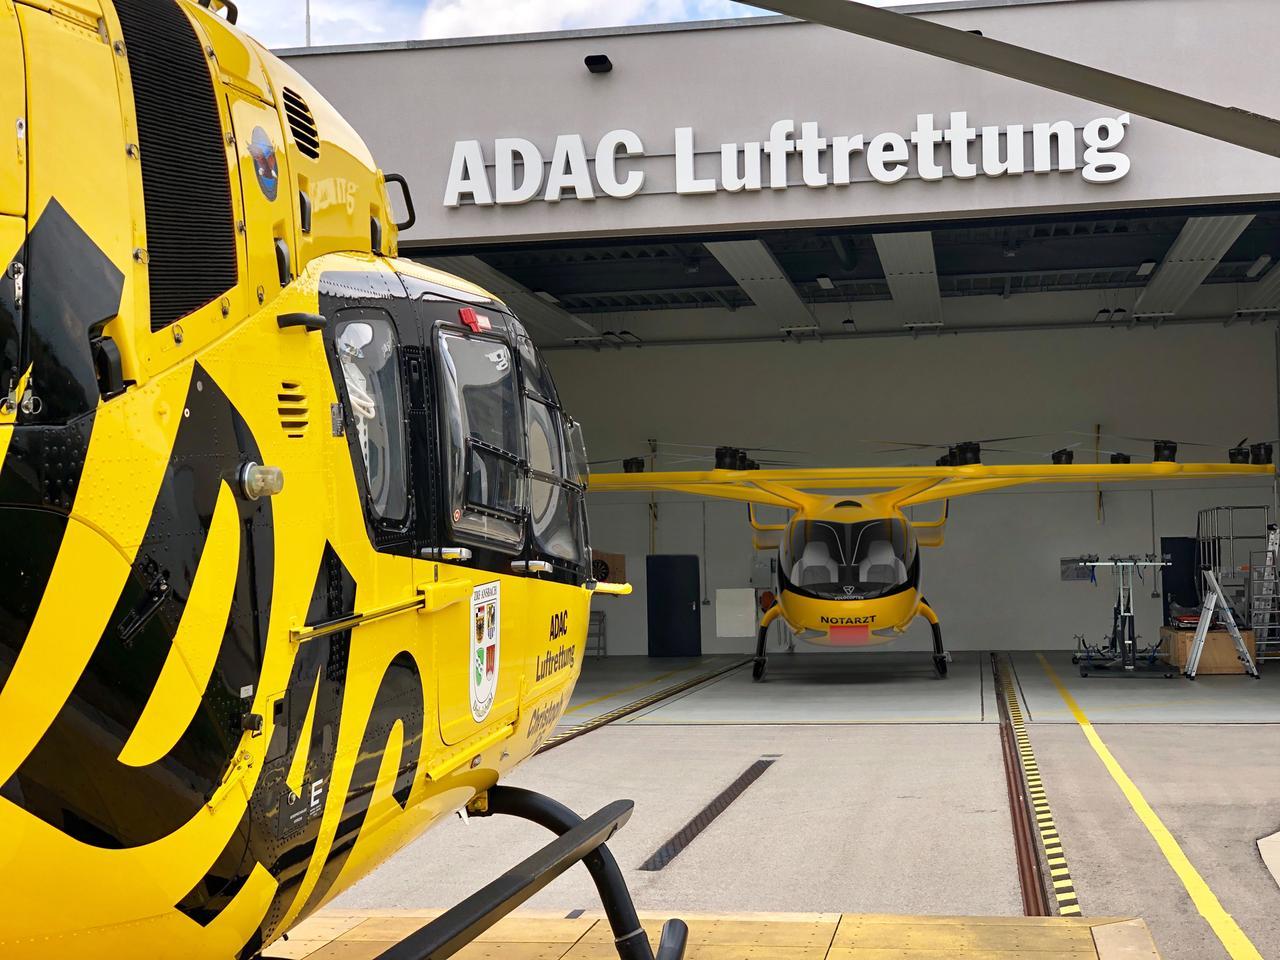 Multirotor eVTOL은 공중 구조 작업에서 헬리콥터를 대체하지 않지만 함께 작동합니다.